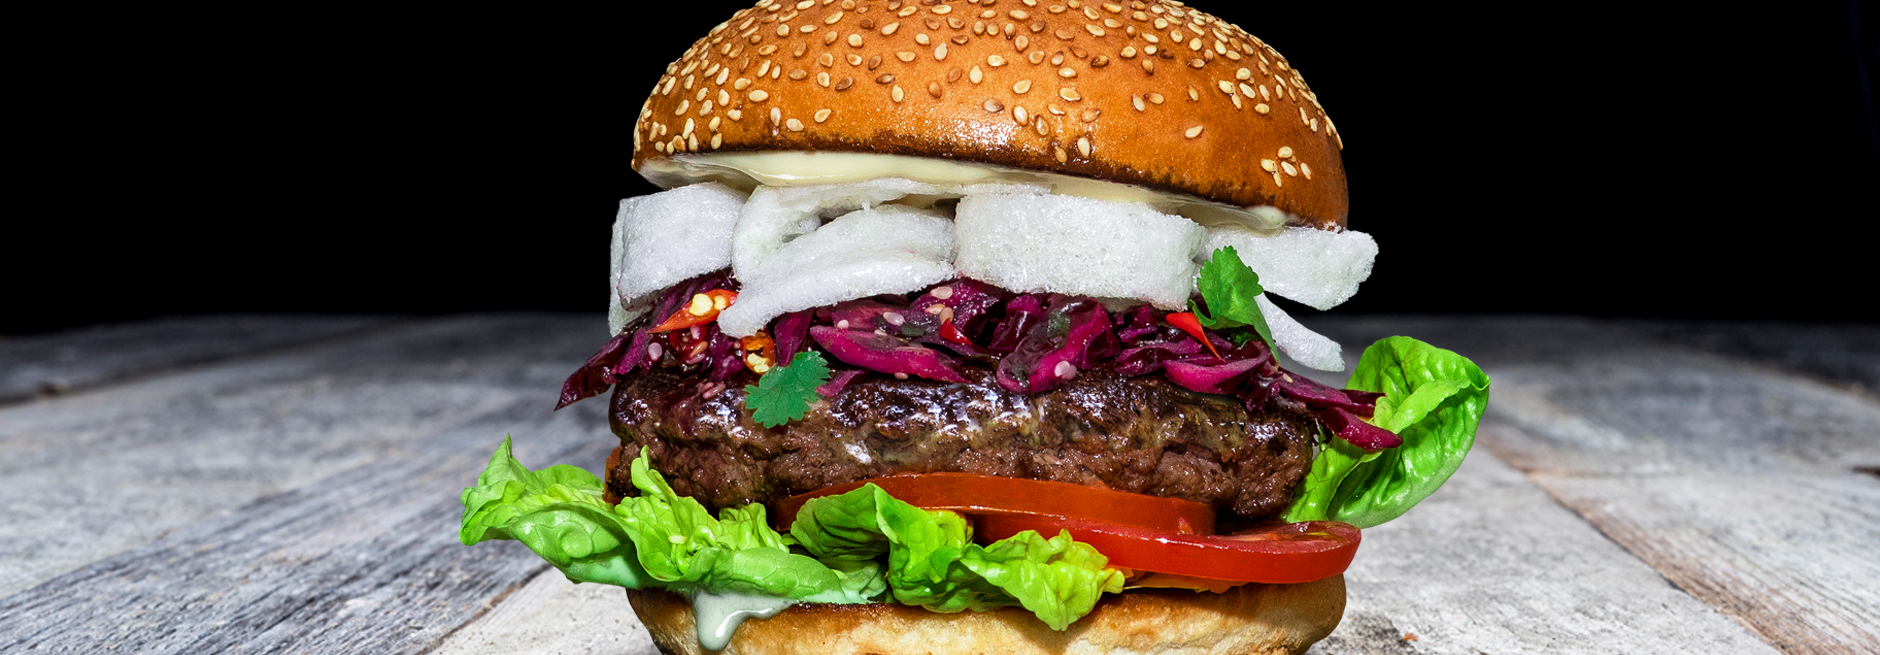 Burger - QMUH - Burgergrill und Steakhouse Bar